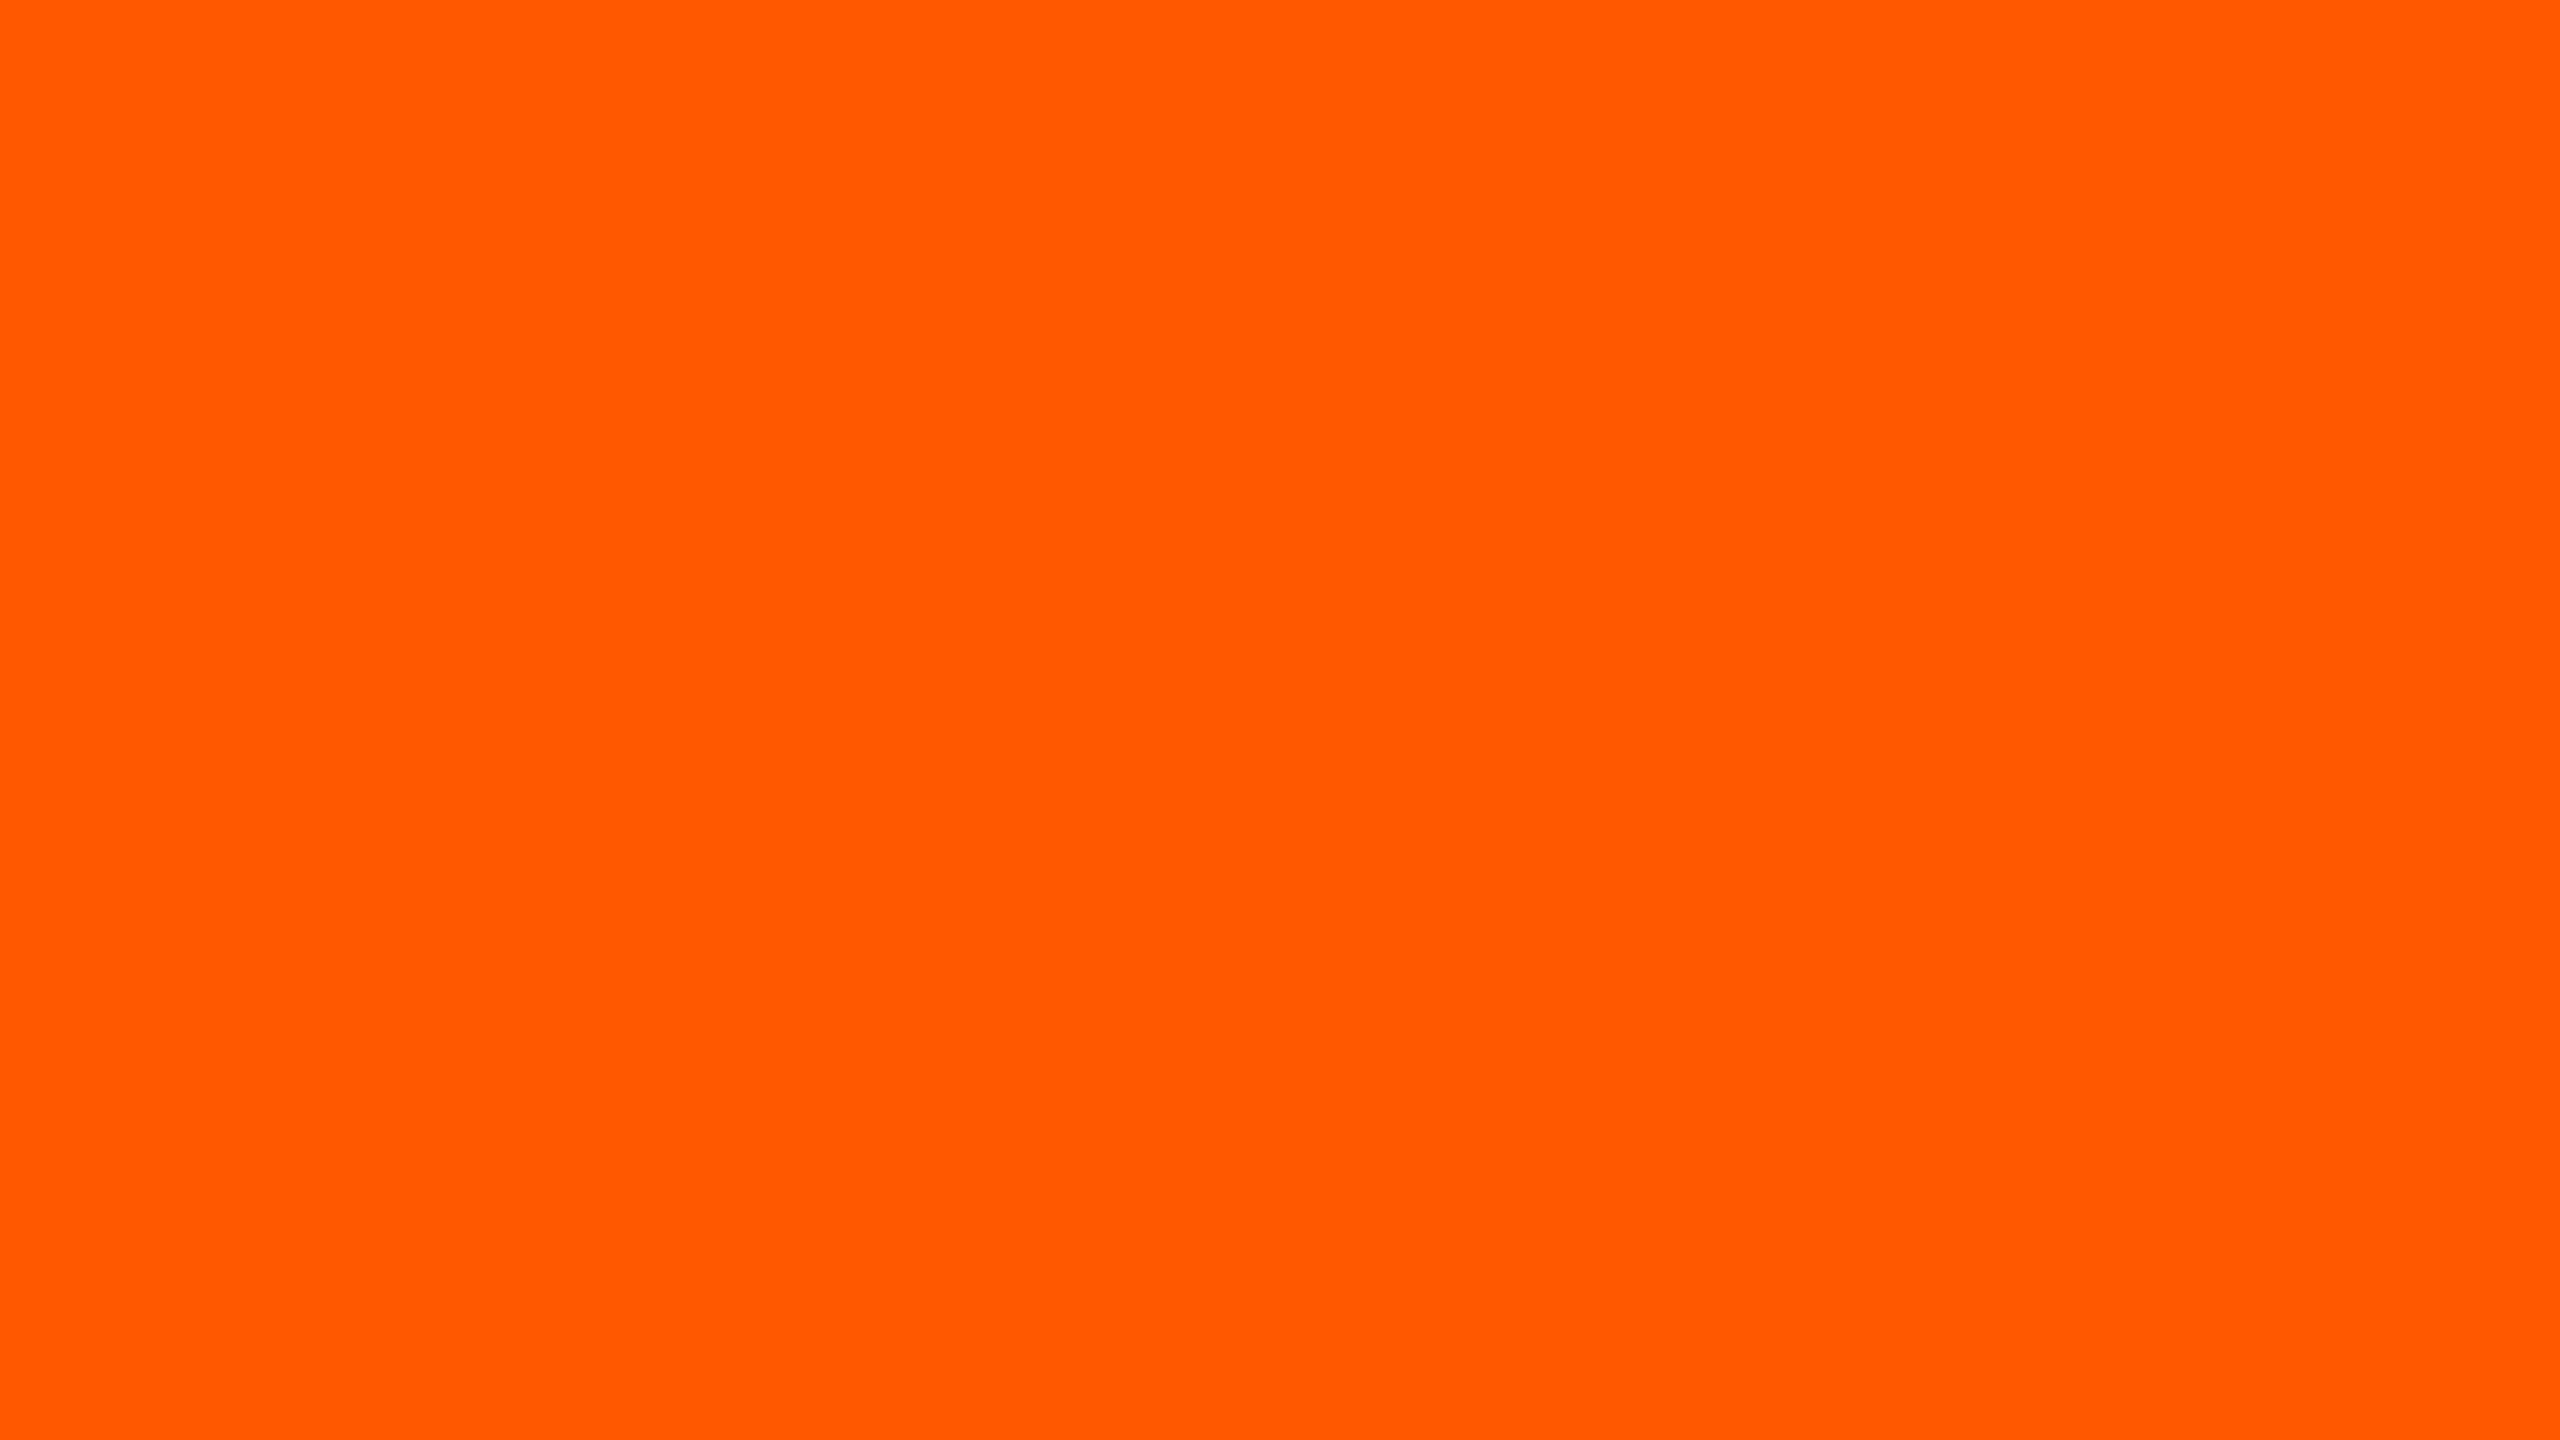 2560x1440 Orange Pantone Solid Color Background